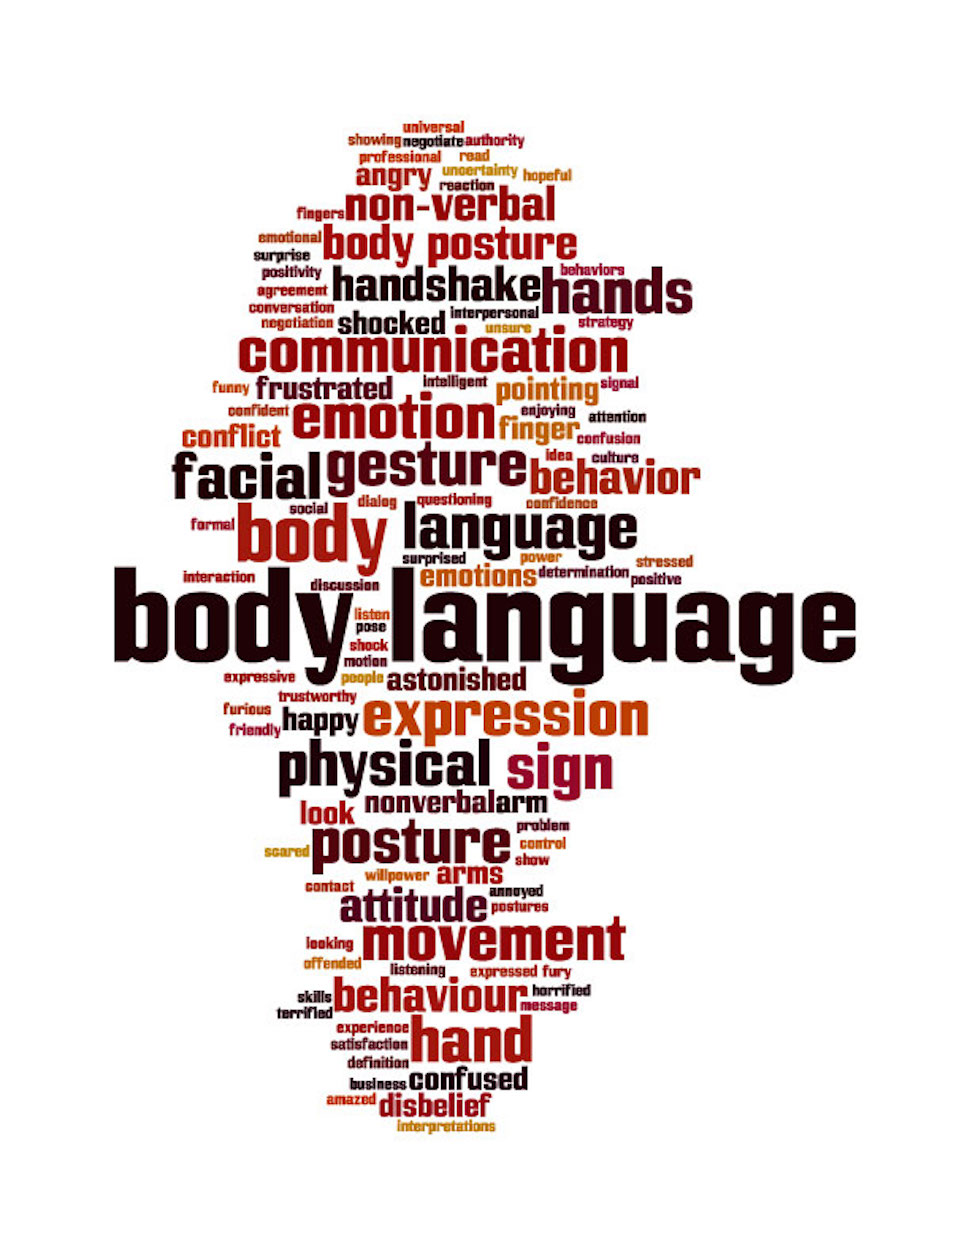 importance of self awareness in nursing practice